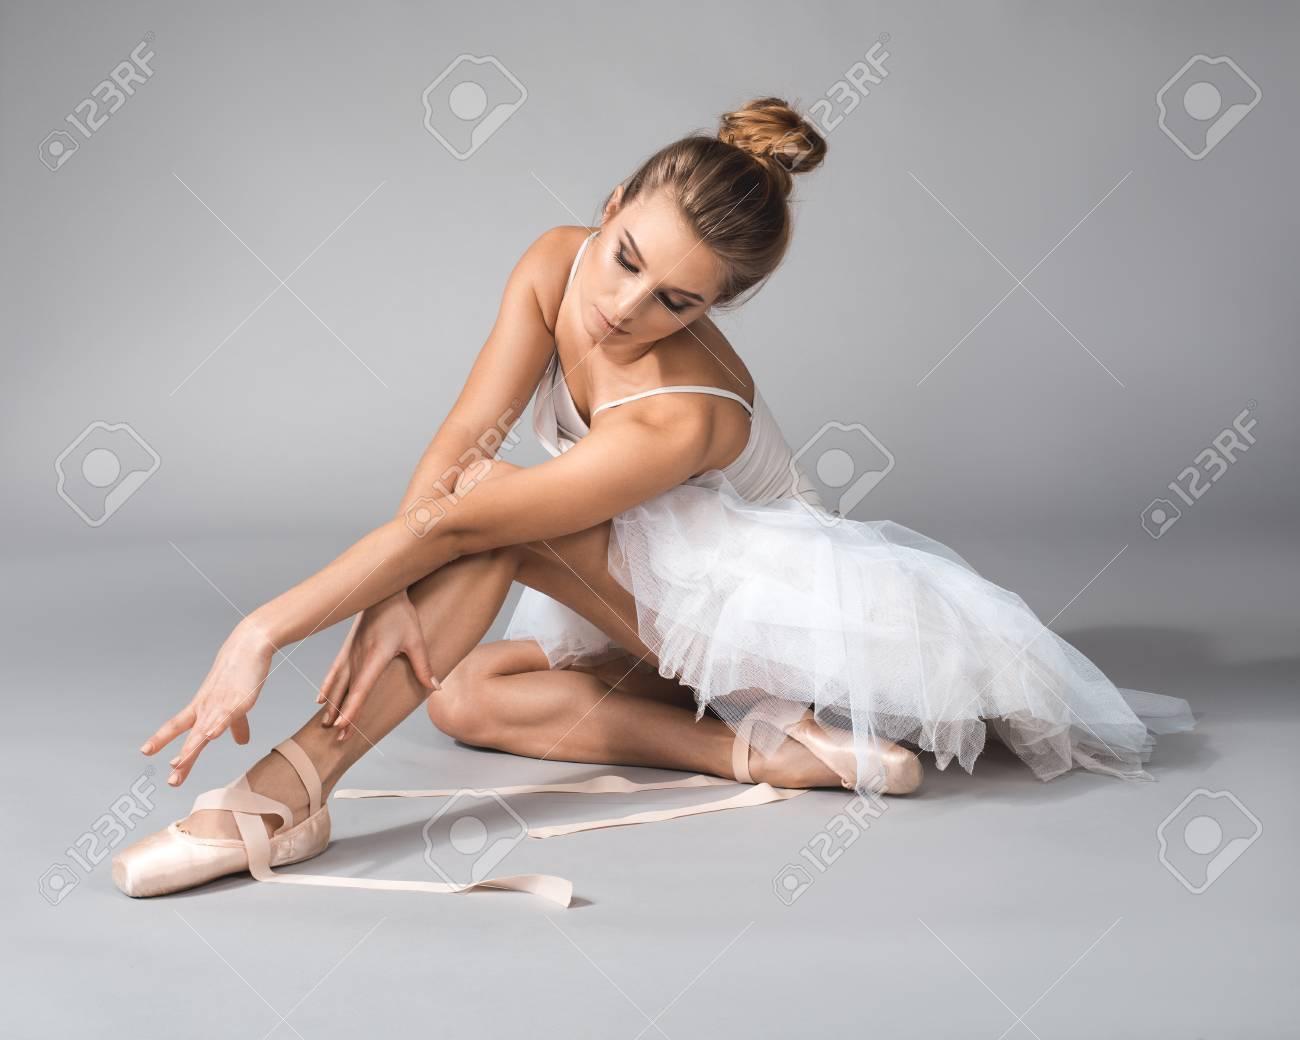 Graceful Ballerina Sitting And Untying